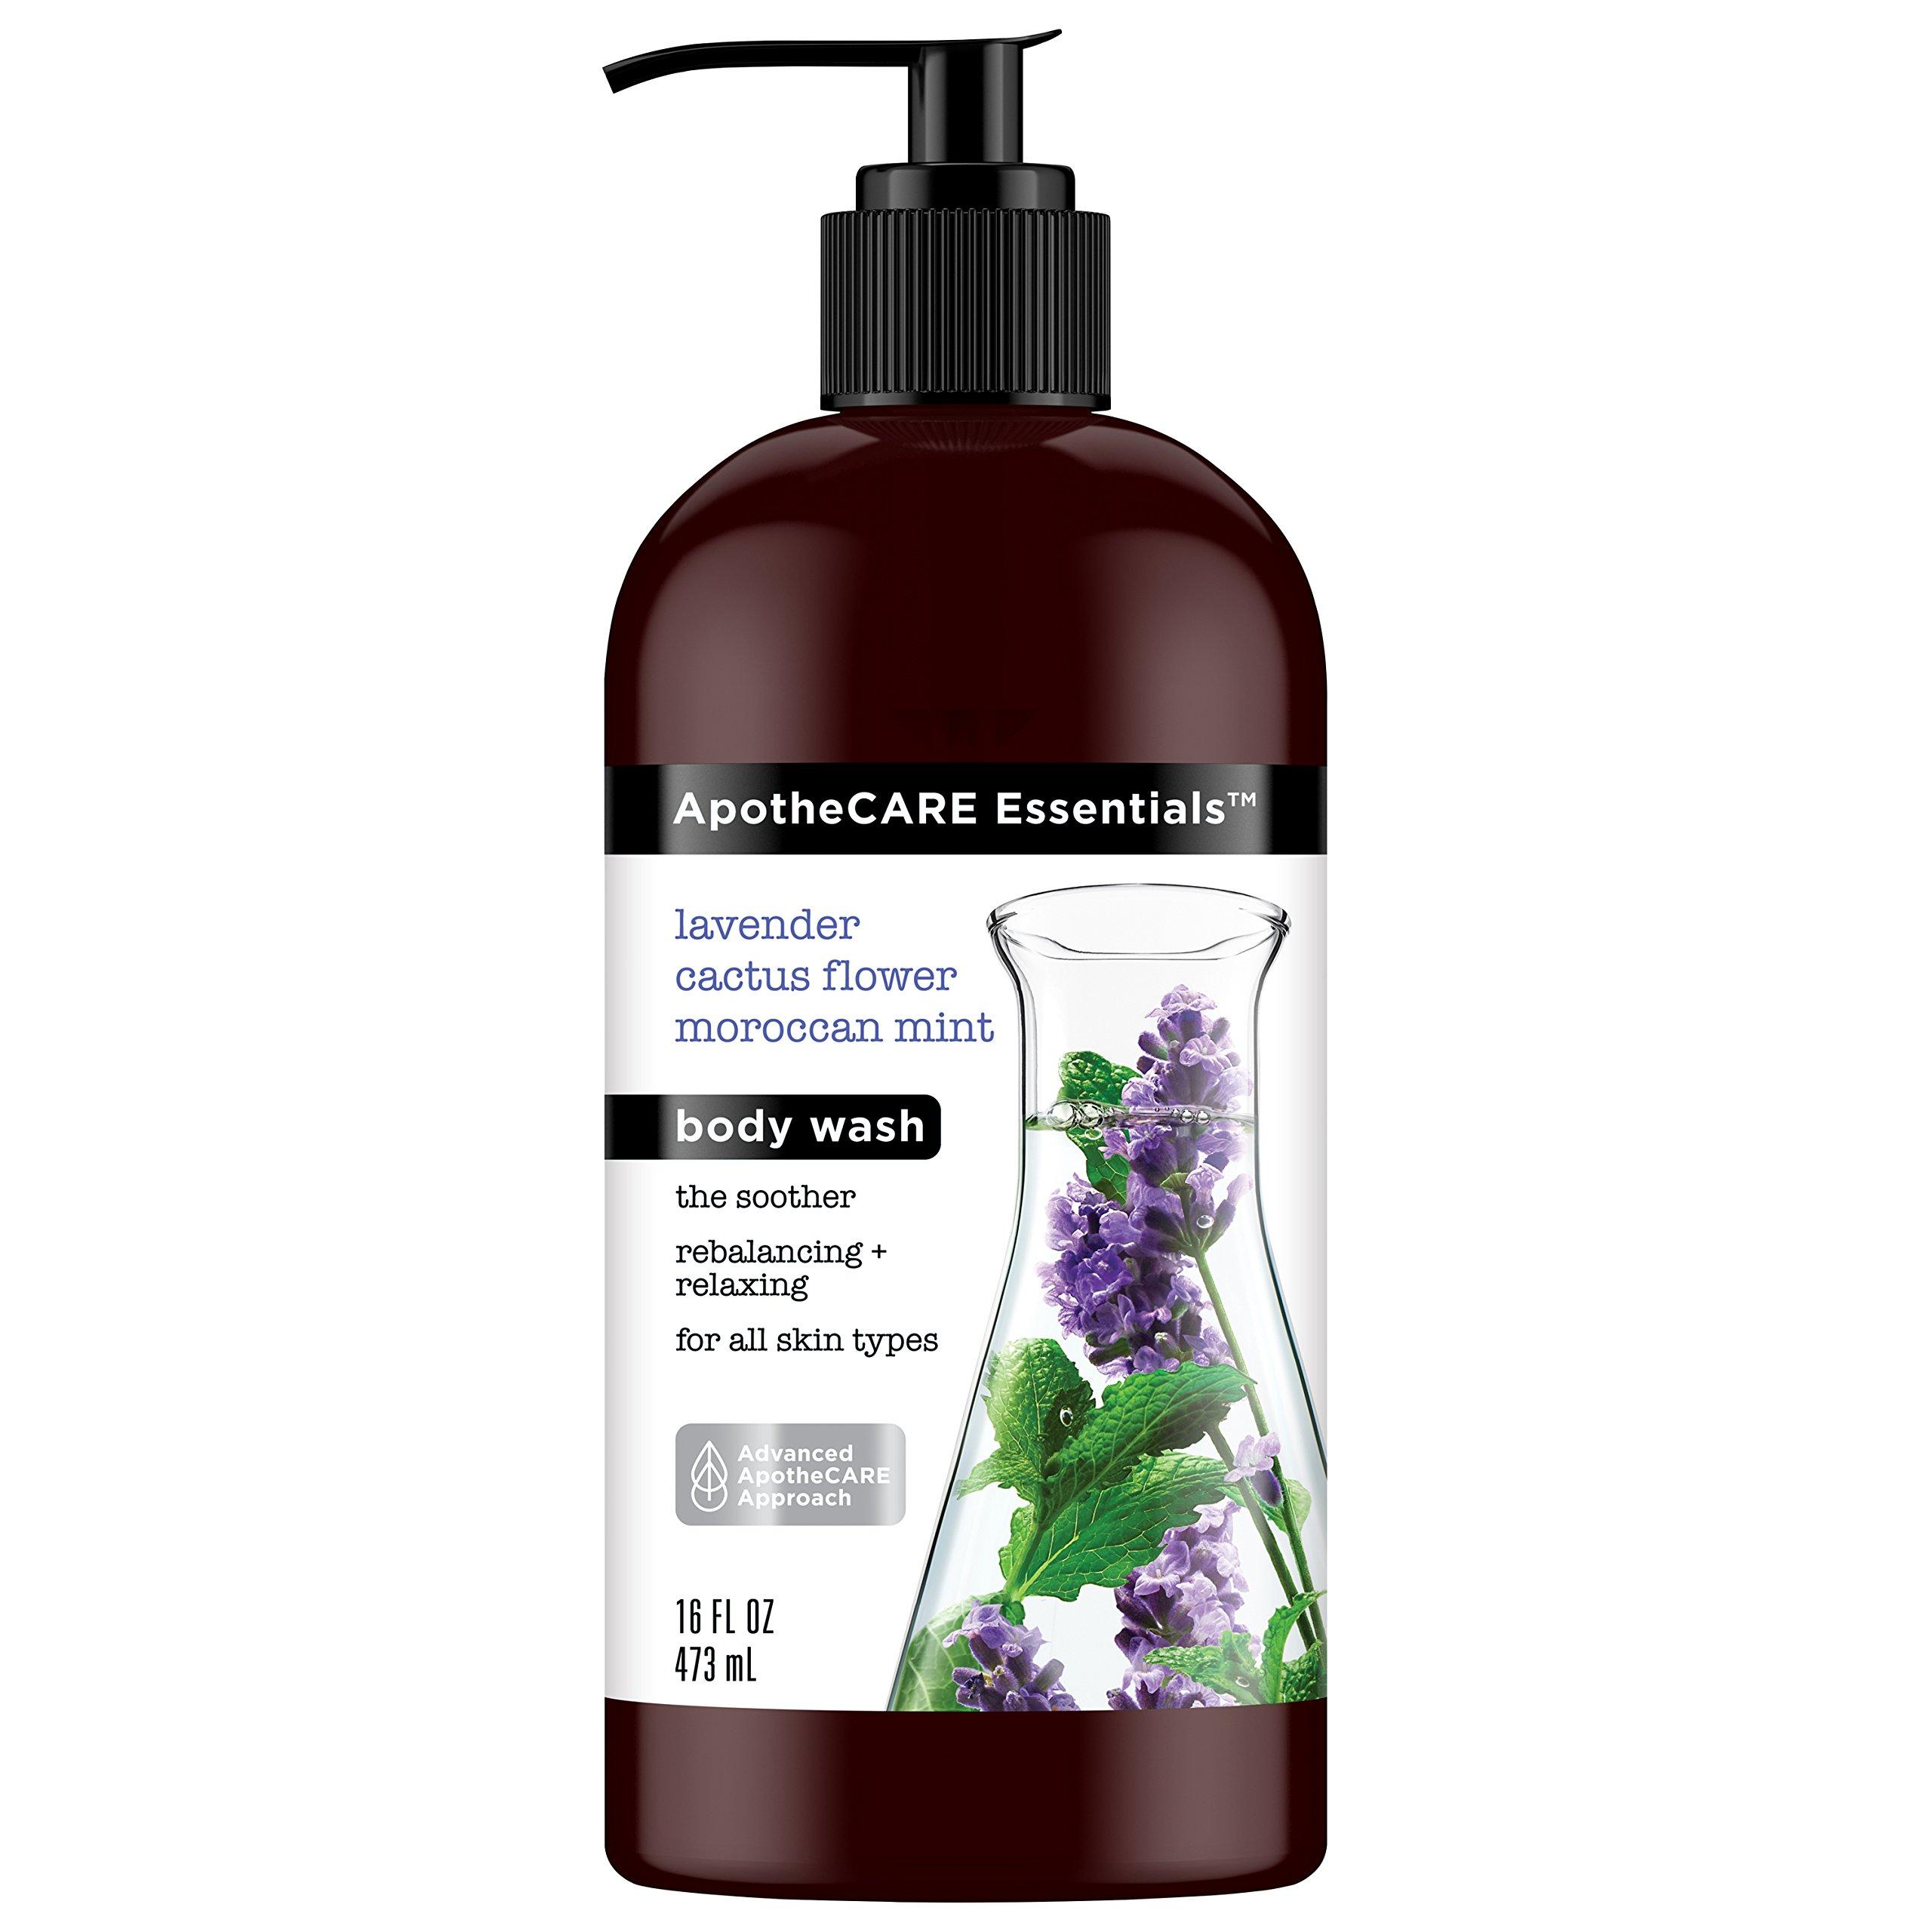 null - ApotheCARE Essentials Body Wash, Lavender, Cactus Flower, Moroccan Mint, 16 oz